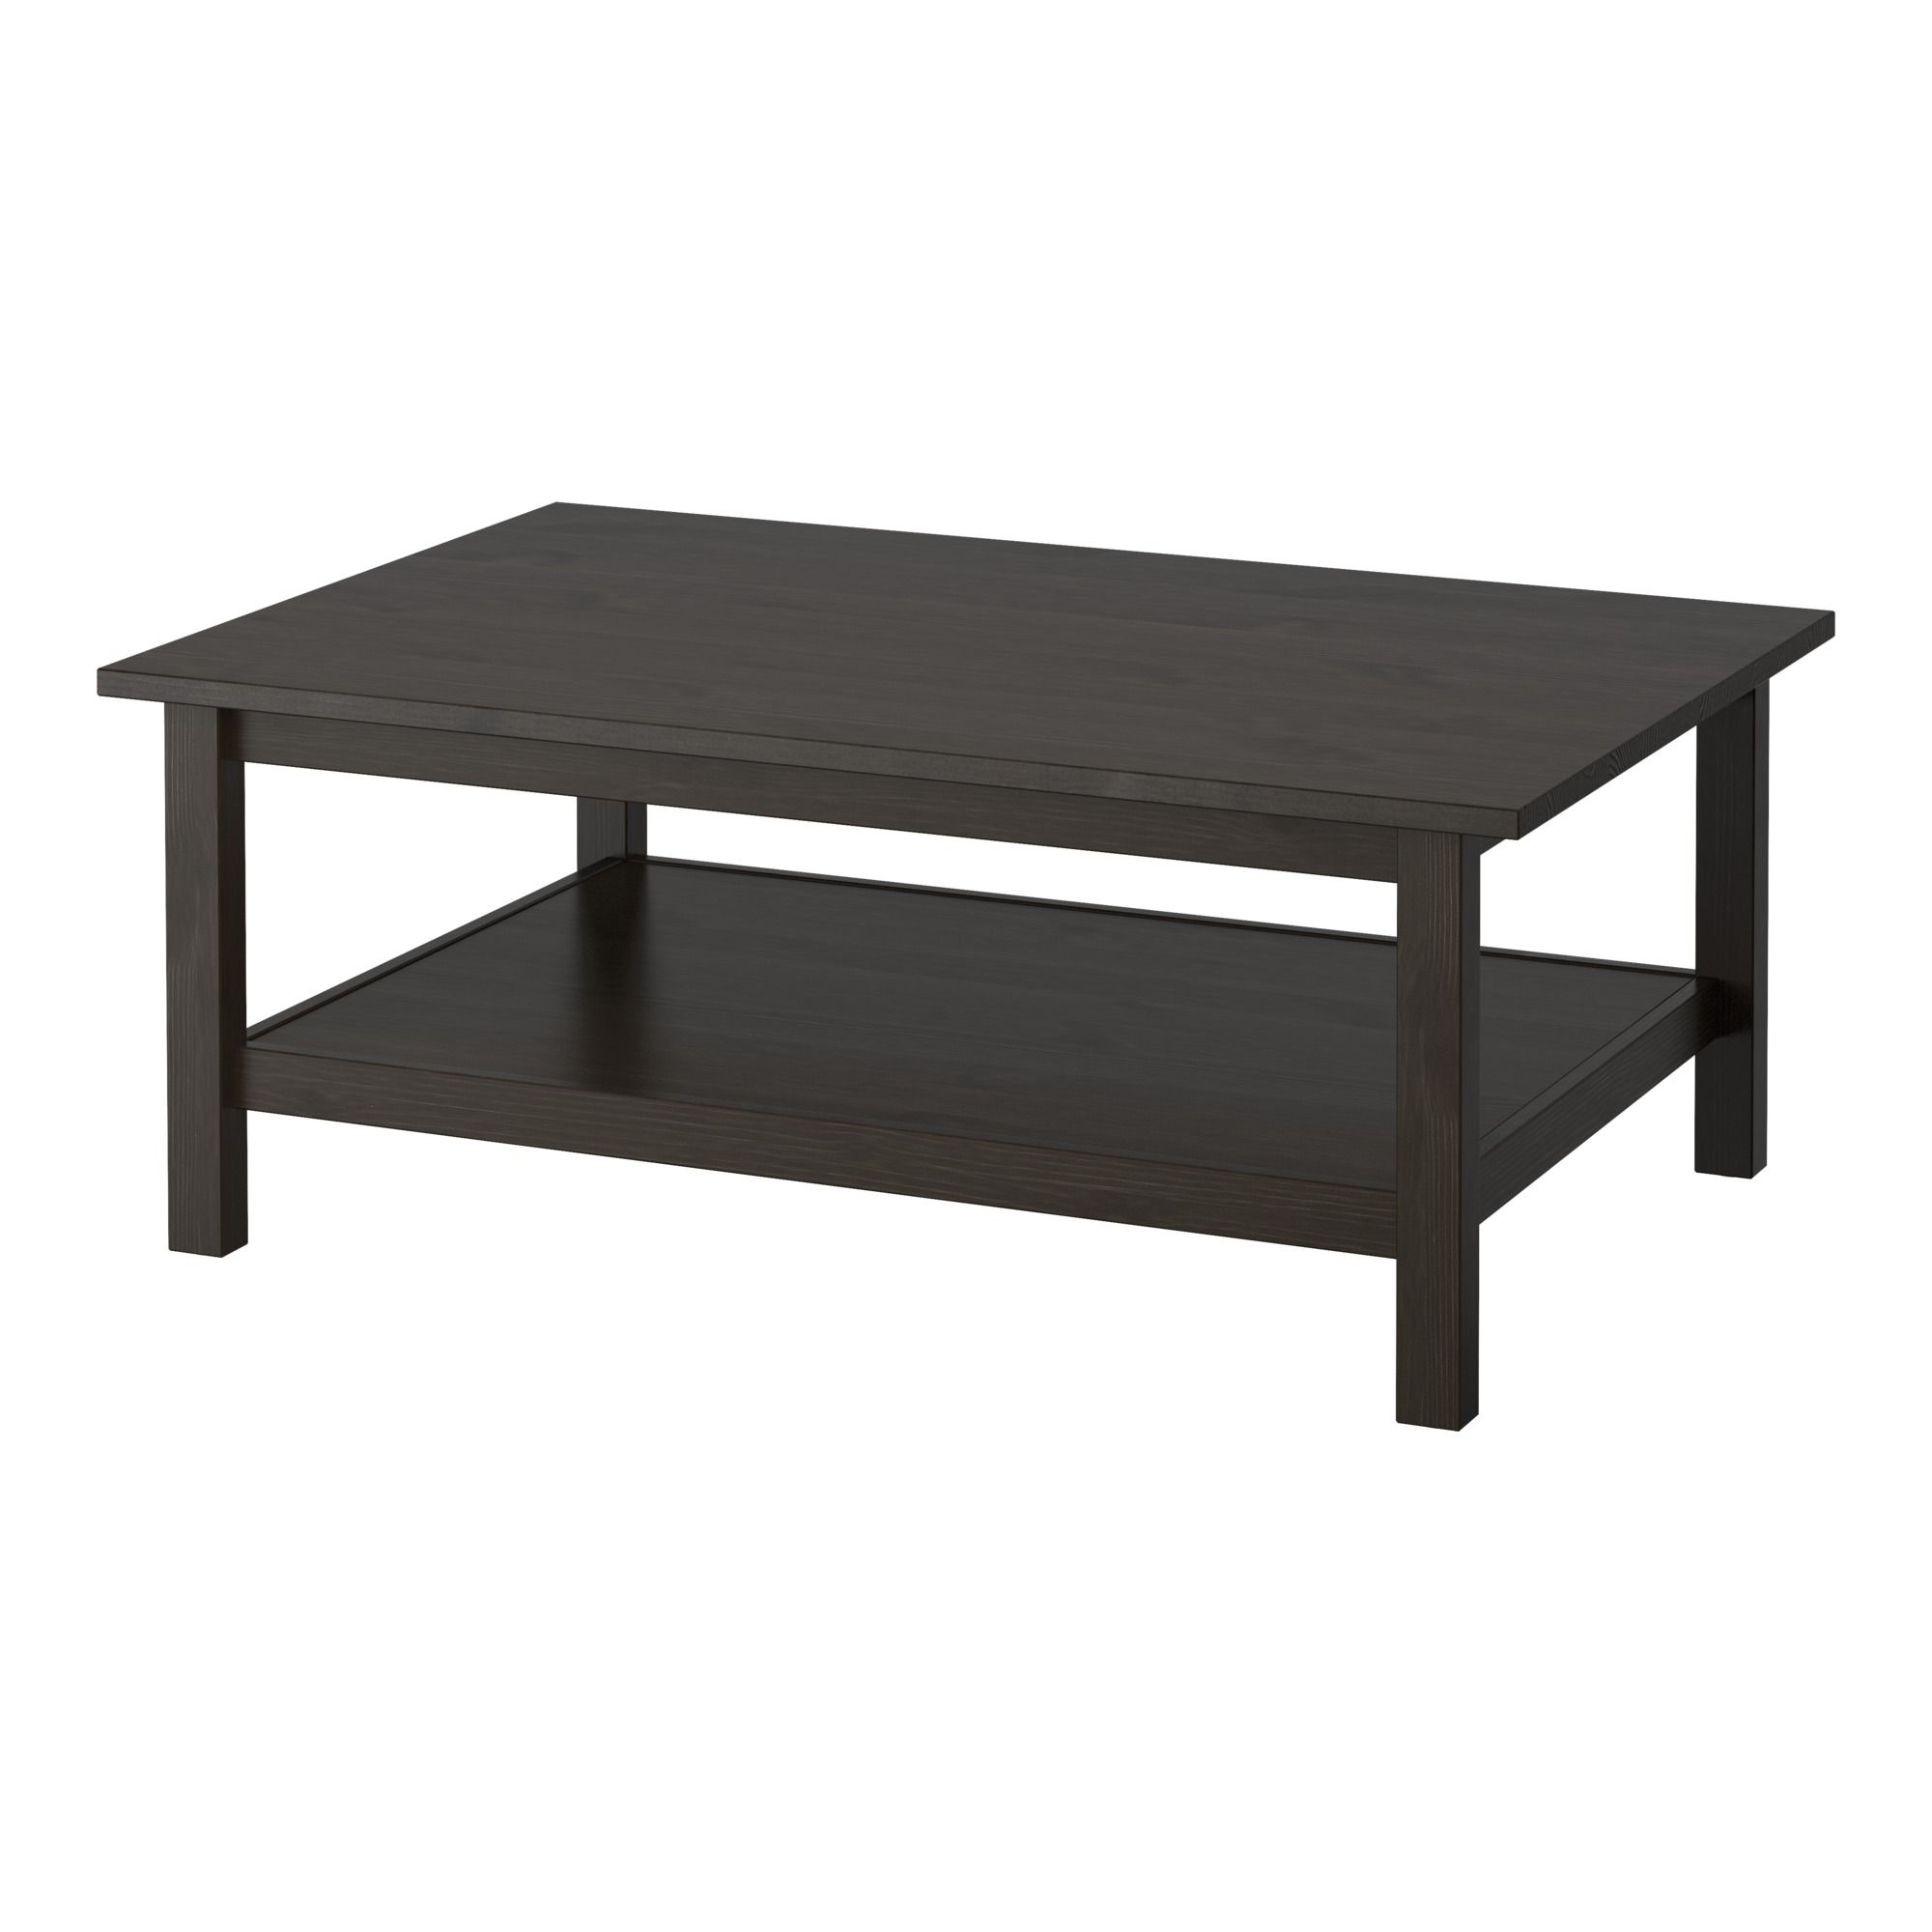 Furniture Home Furnishings Find Your Inspiration Ikea Coffee Table Coffee Table Ikea Hemnes Coffee Table [ 2000 x 2000 Pixel ]